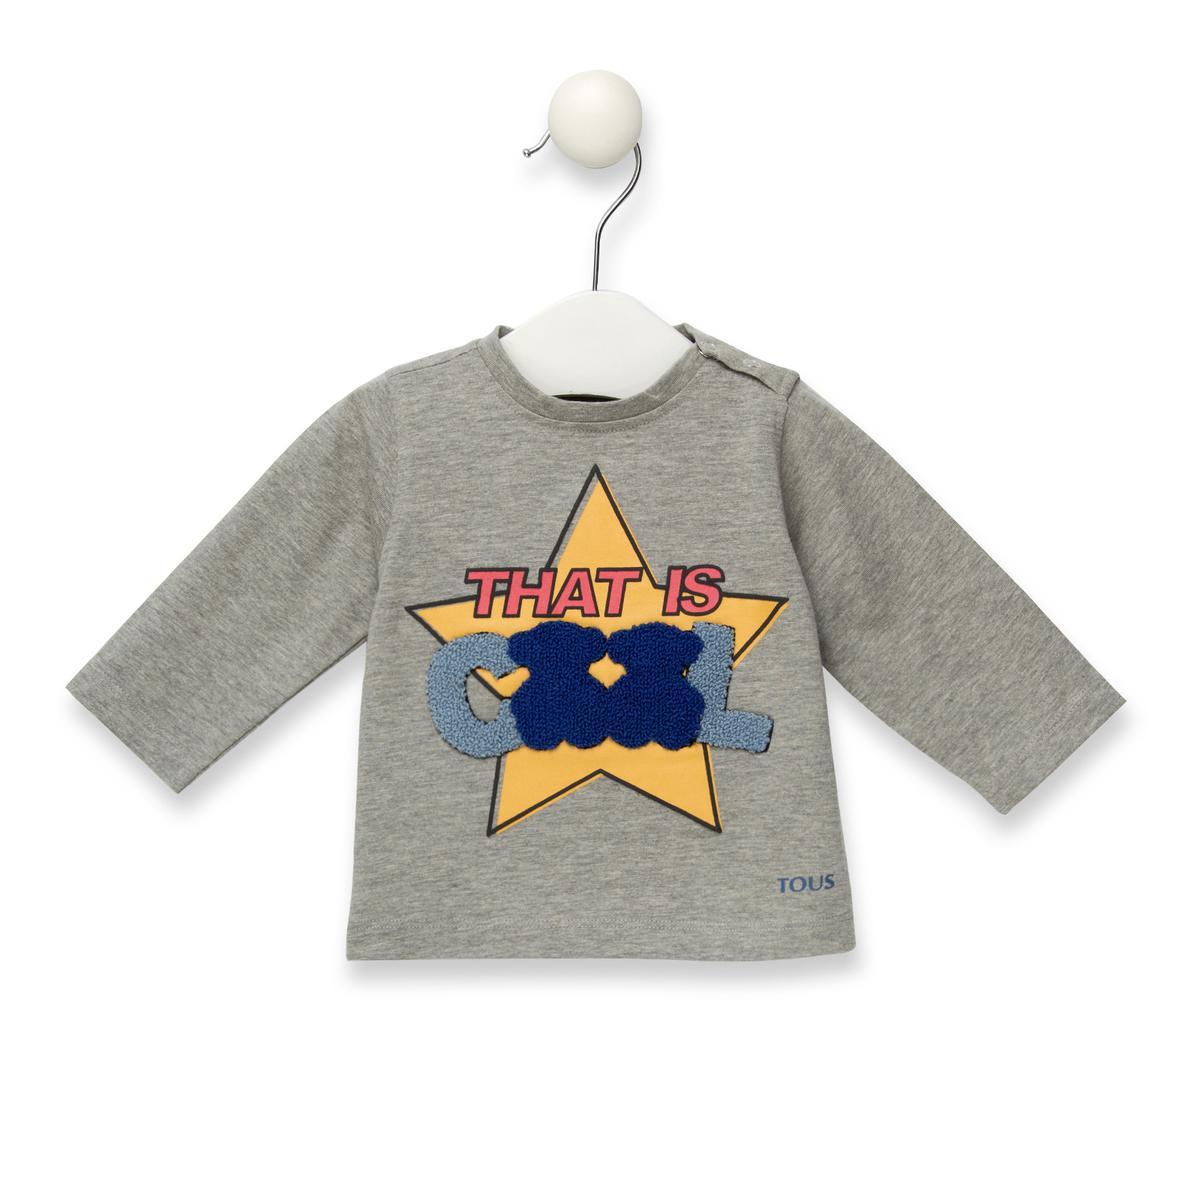 Camiseta Baby Tous manga larga de niño Casual color gris.